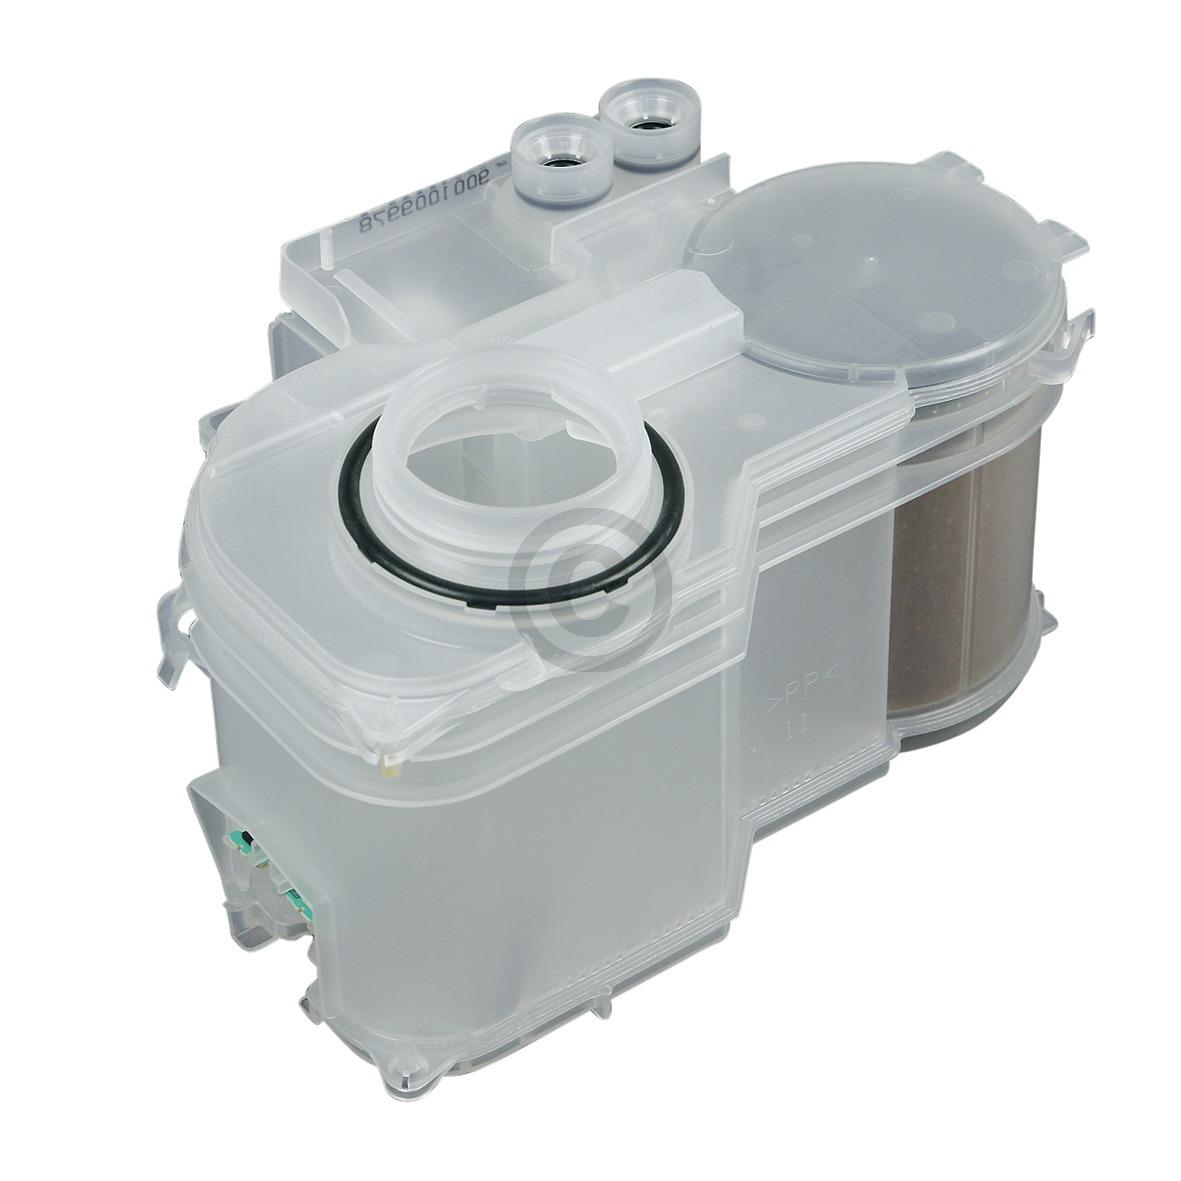 Salzbehälter Bosch 00754350 für Geschirrspüler Bosch, Siemens, Neff